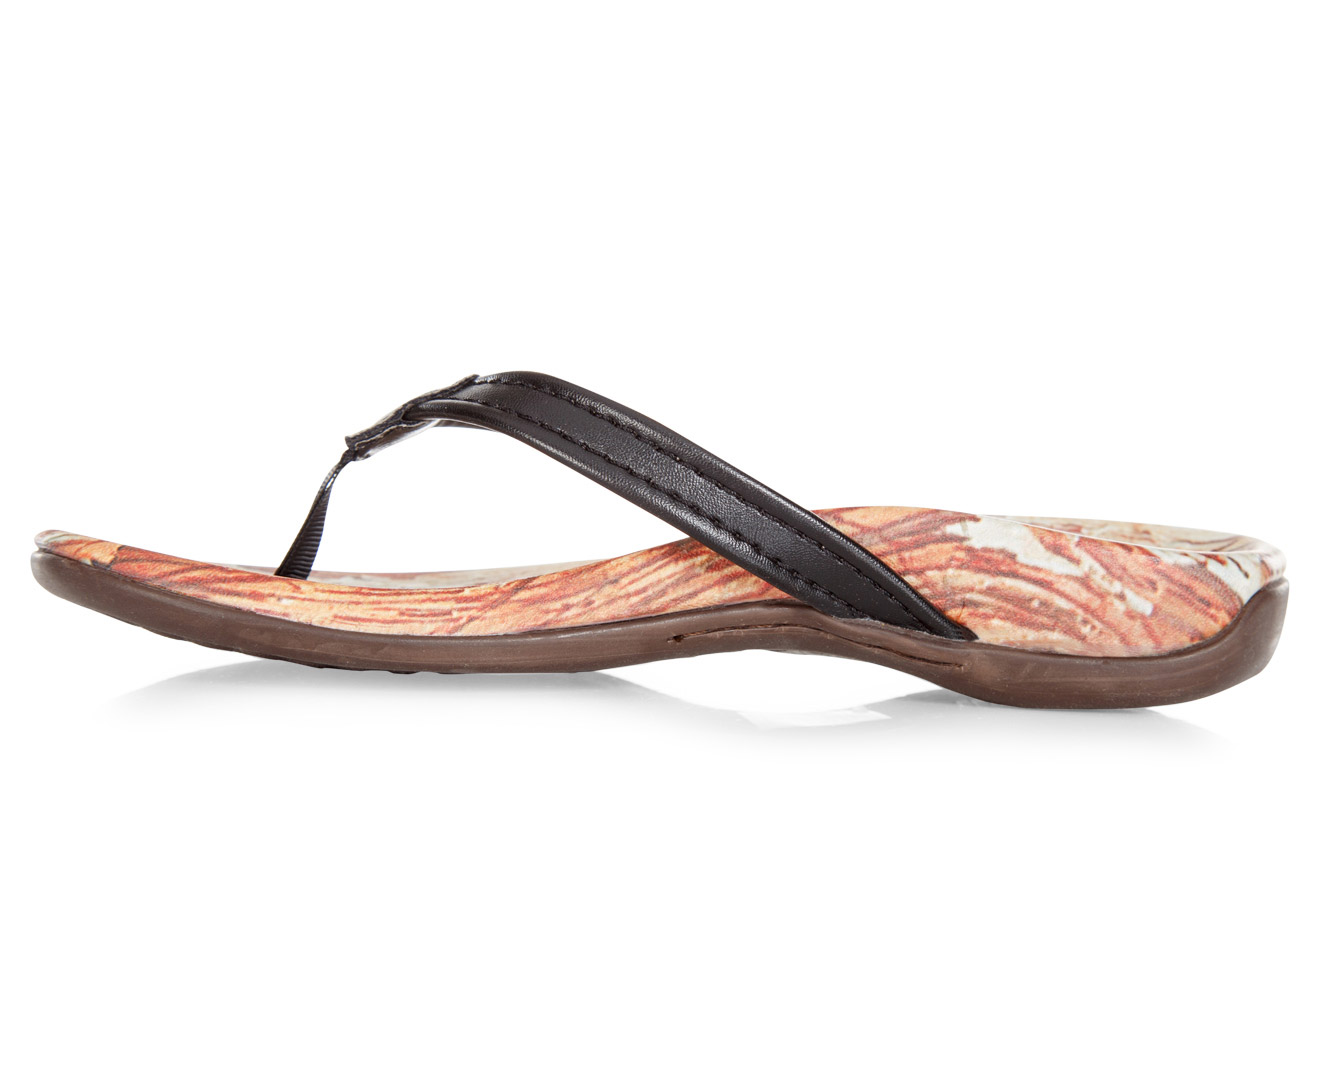 Scholl Orthaheel Shoes Australia